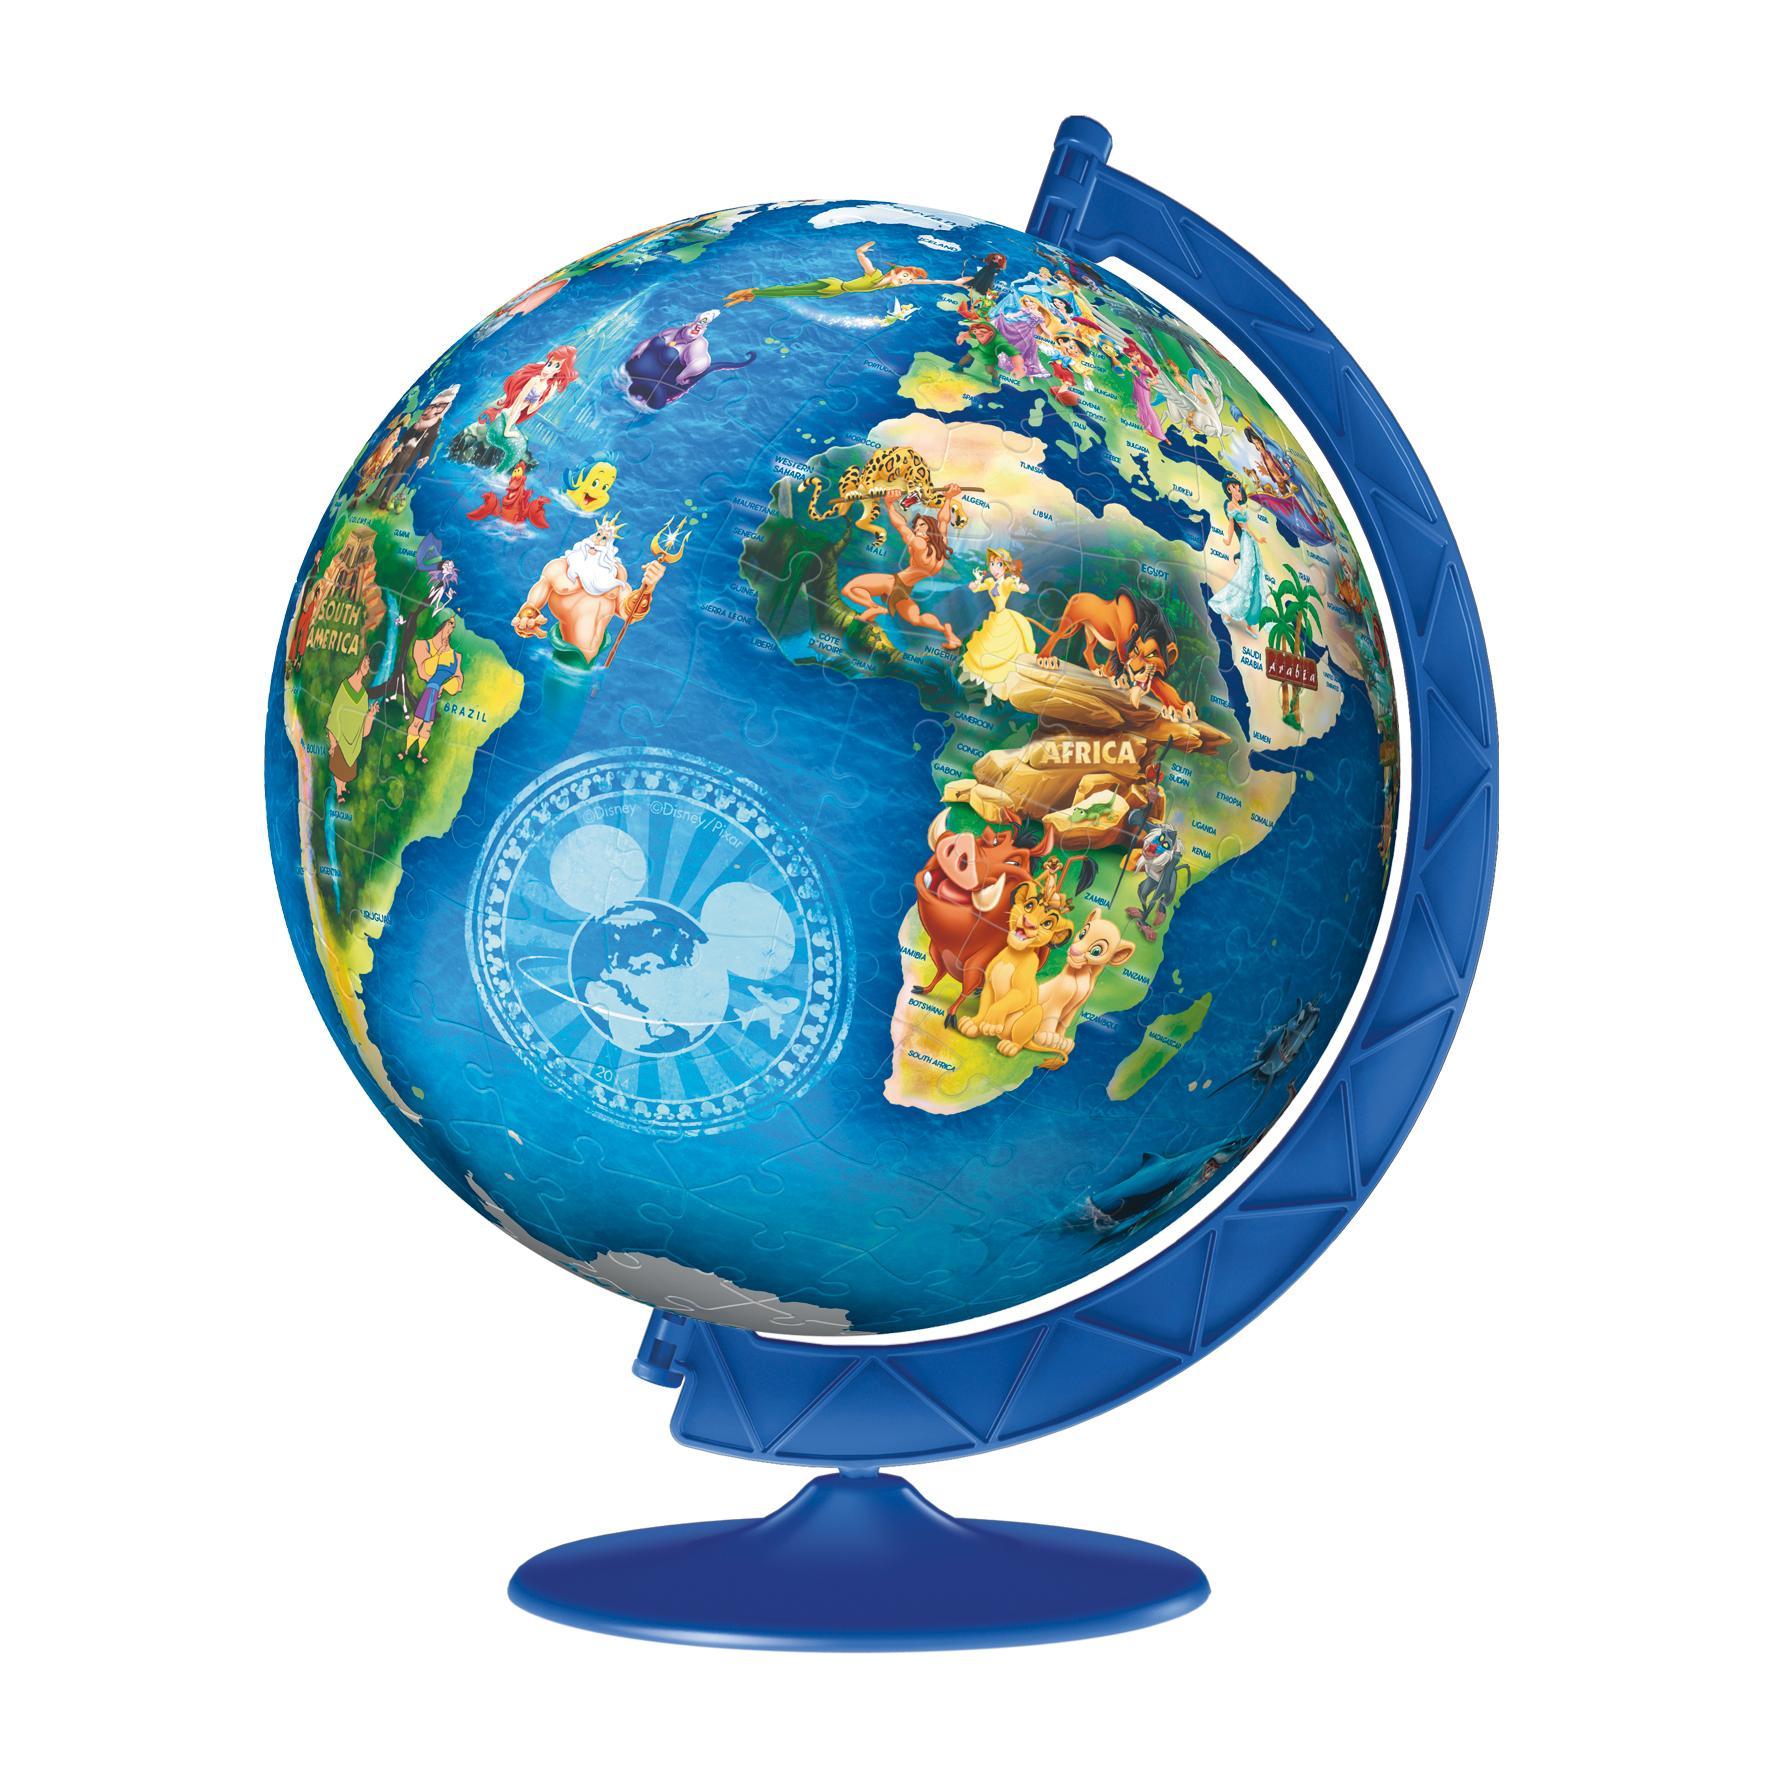 Ravensburger 3d puzzle disney globe 180 pc 3 d puzzles from the manufacturer gumiabroncs Images